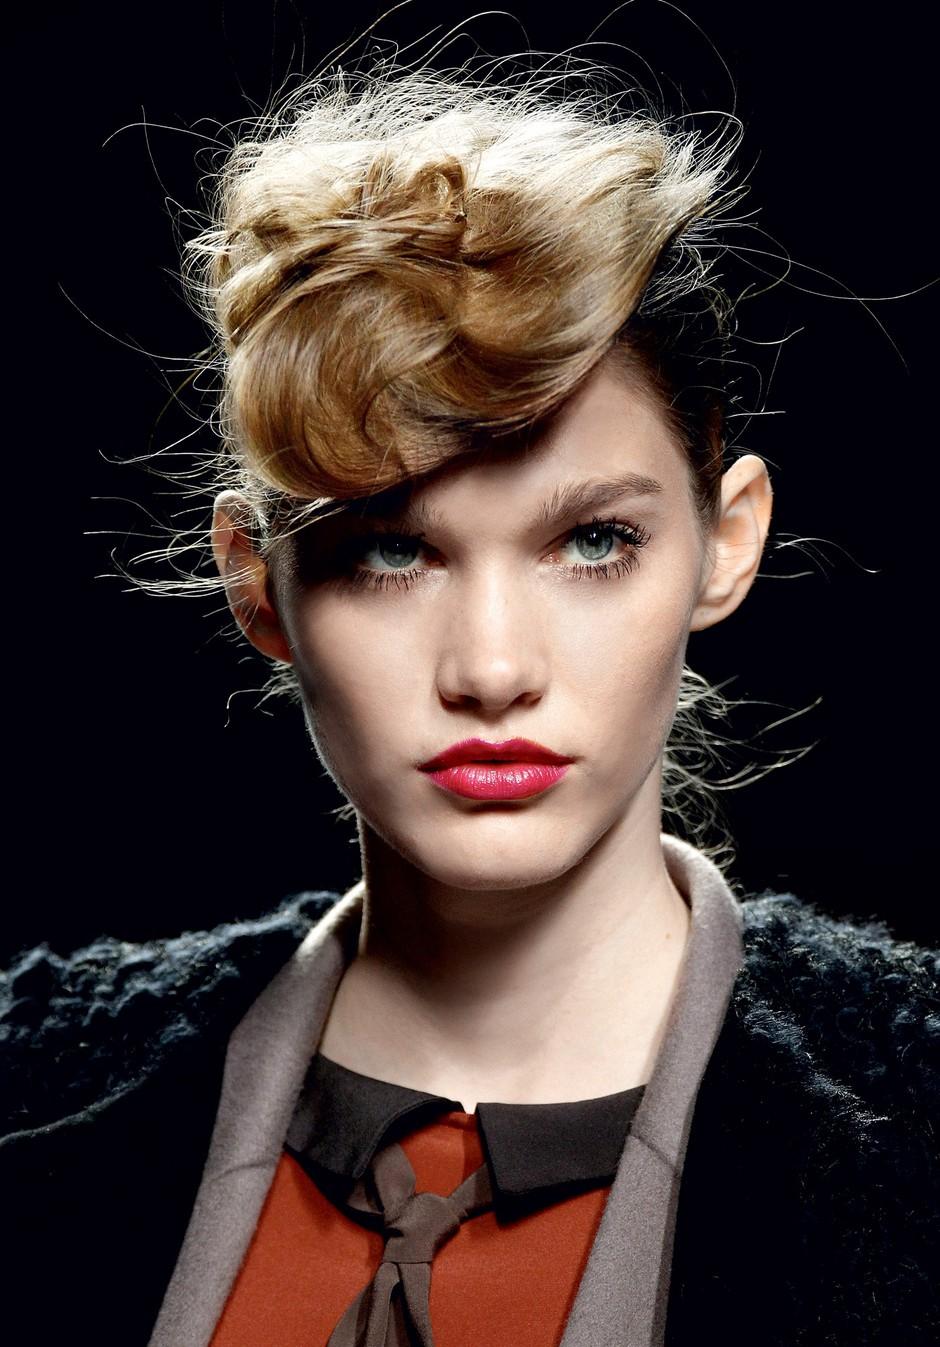 Lasje kot modni dodatek (foto: Alex Štokelj, All-About-Fashion)